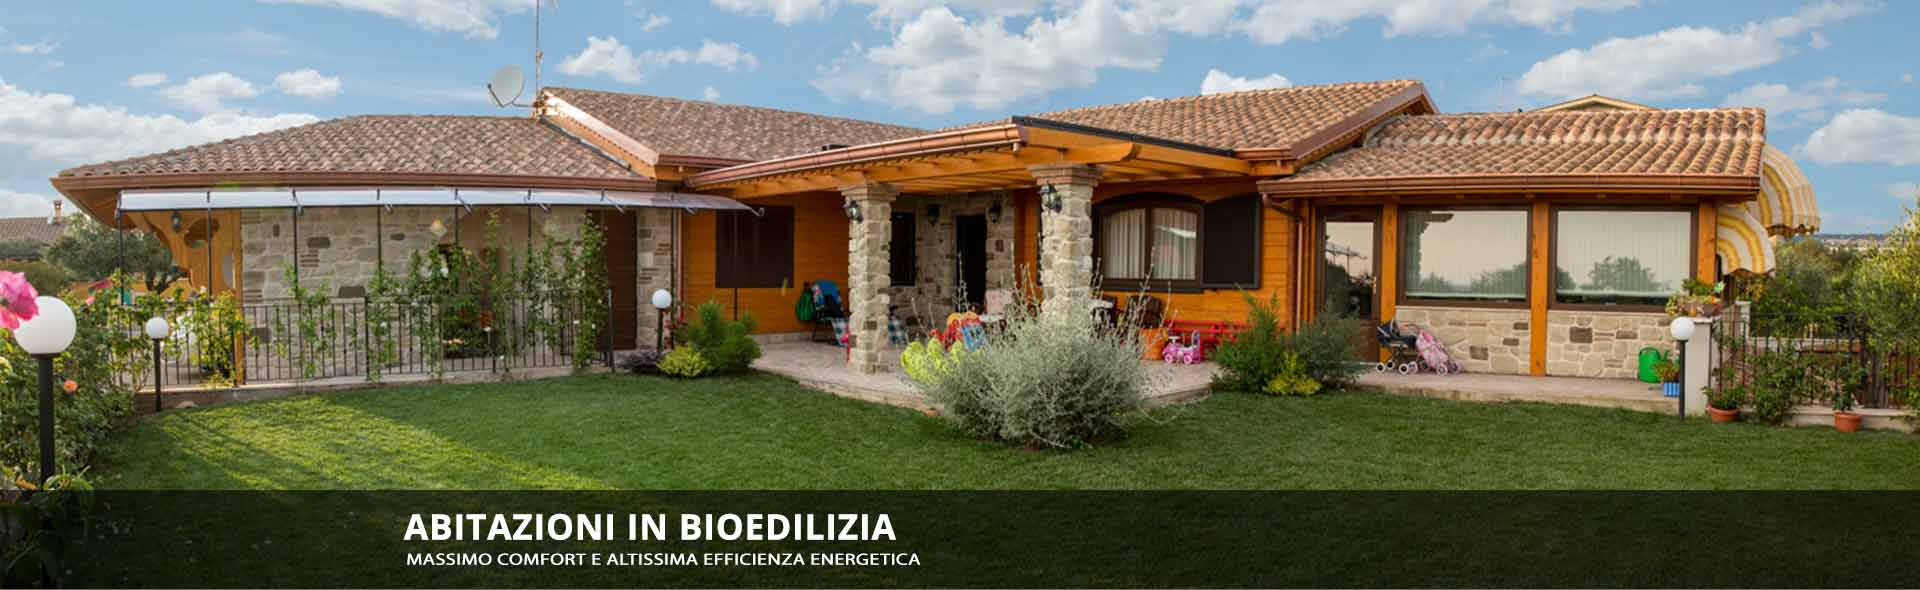 Legno lamellare per bioedilizia coperture tettoie pergolati - Prefabbricato casa ...